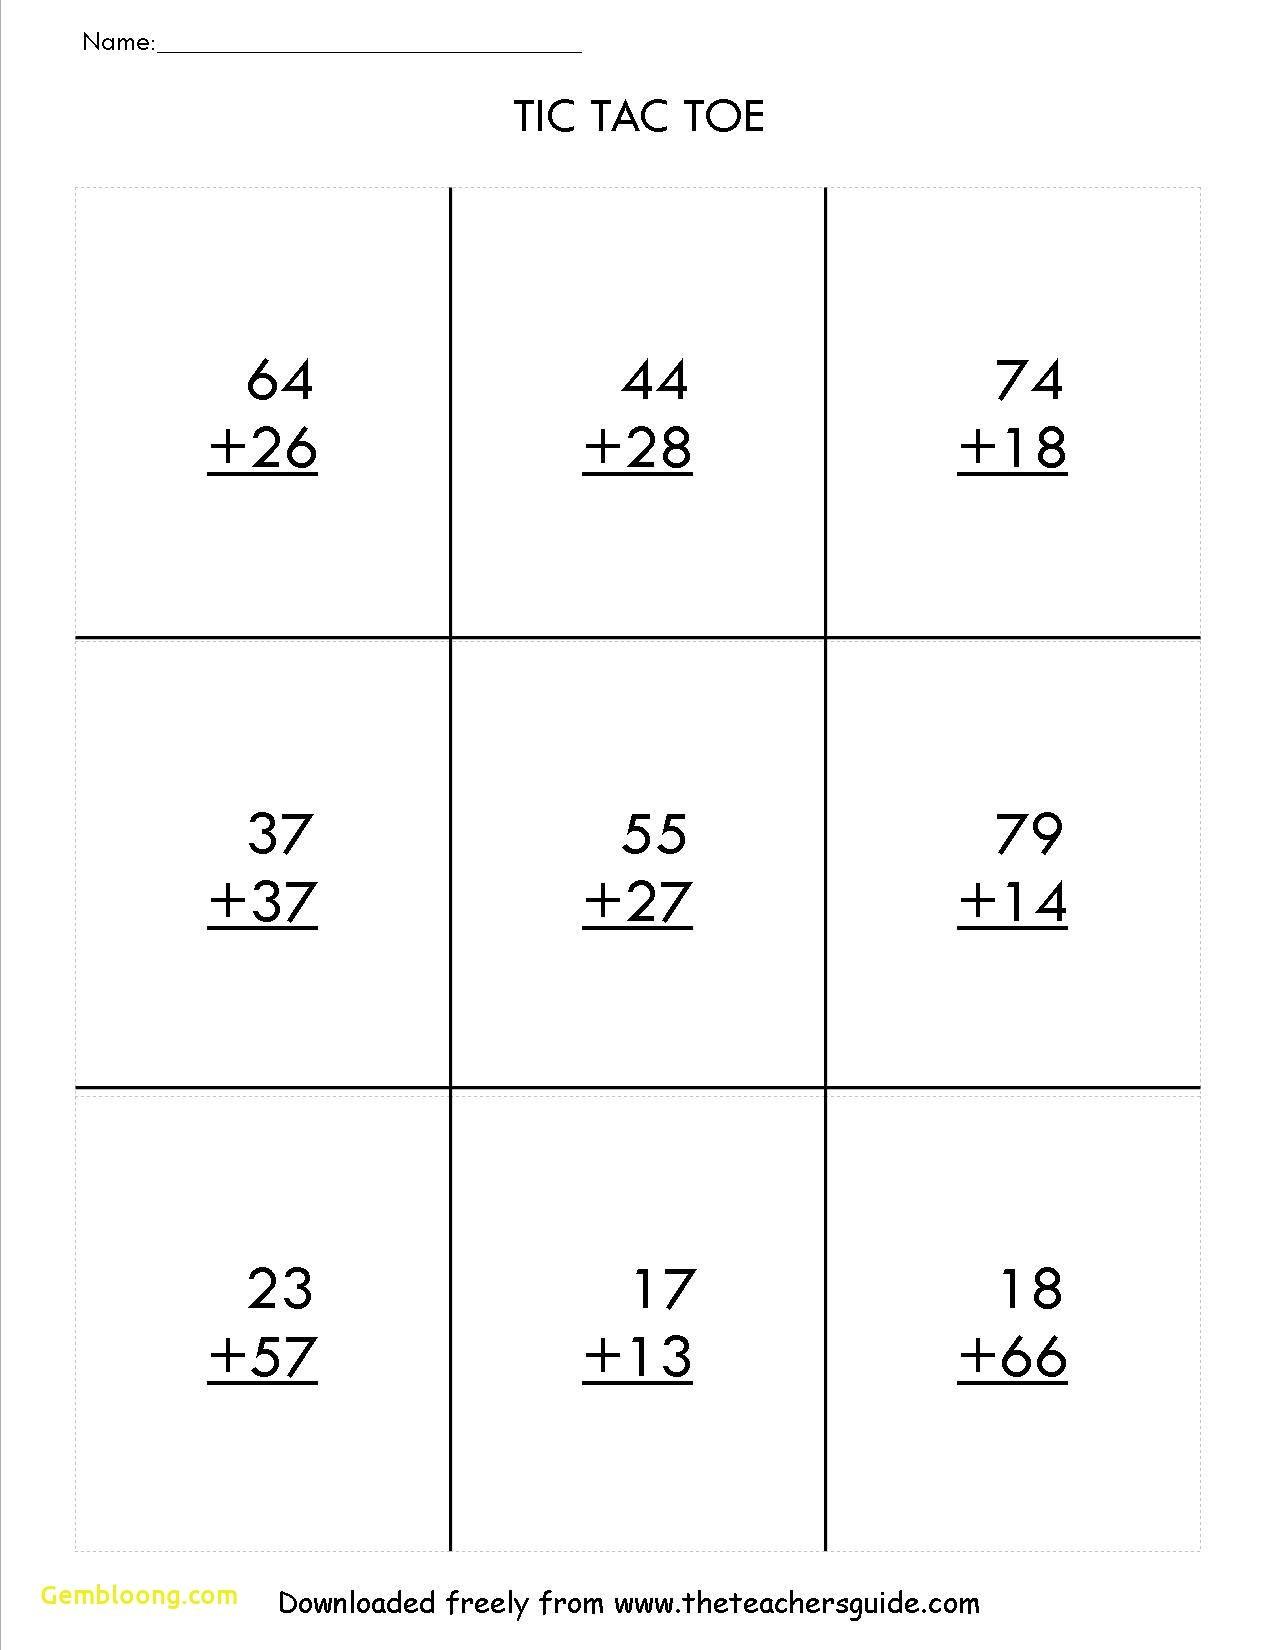 New 2 Digit Addition And Subtraction Worksheets Worksheet Printable 2nd Grade Math Worksheets Math Worksheets 2nd Grade Math